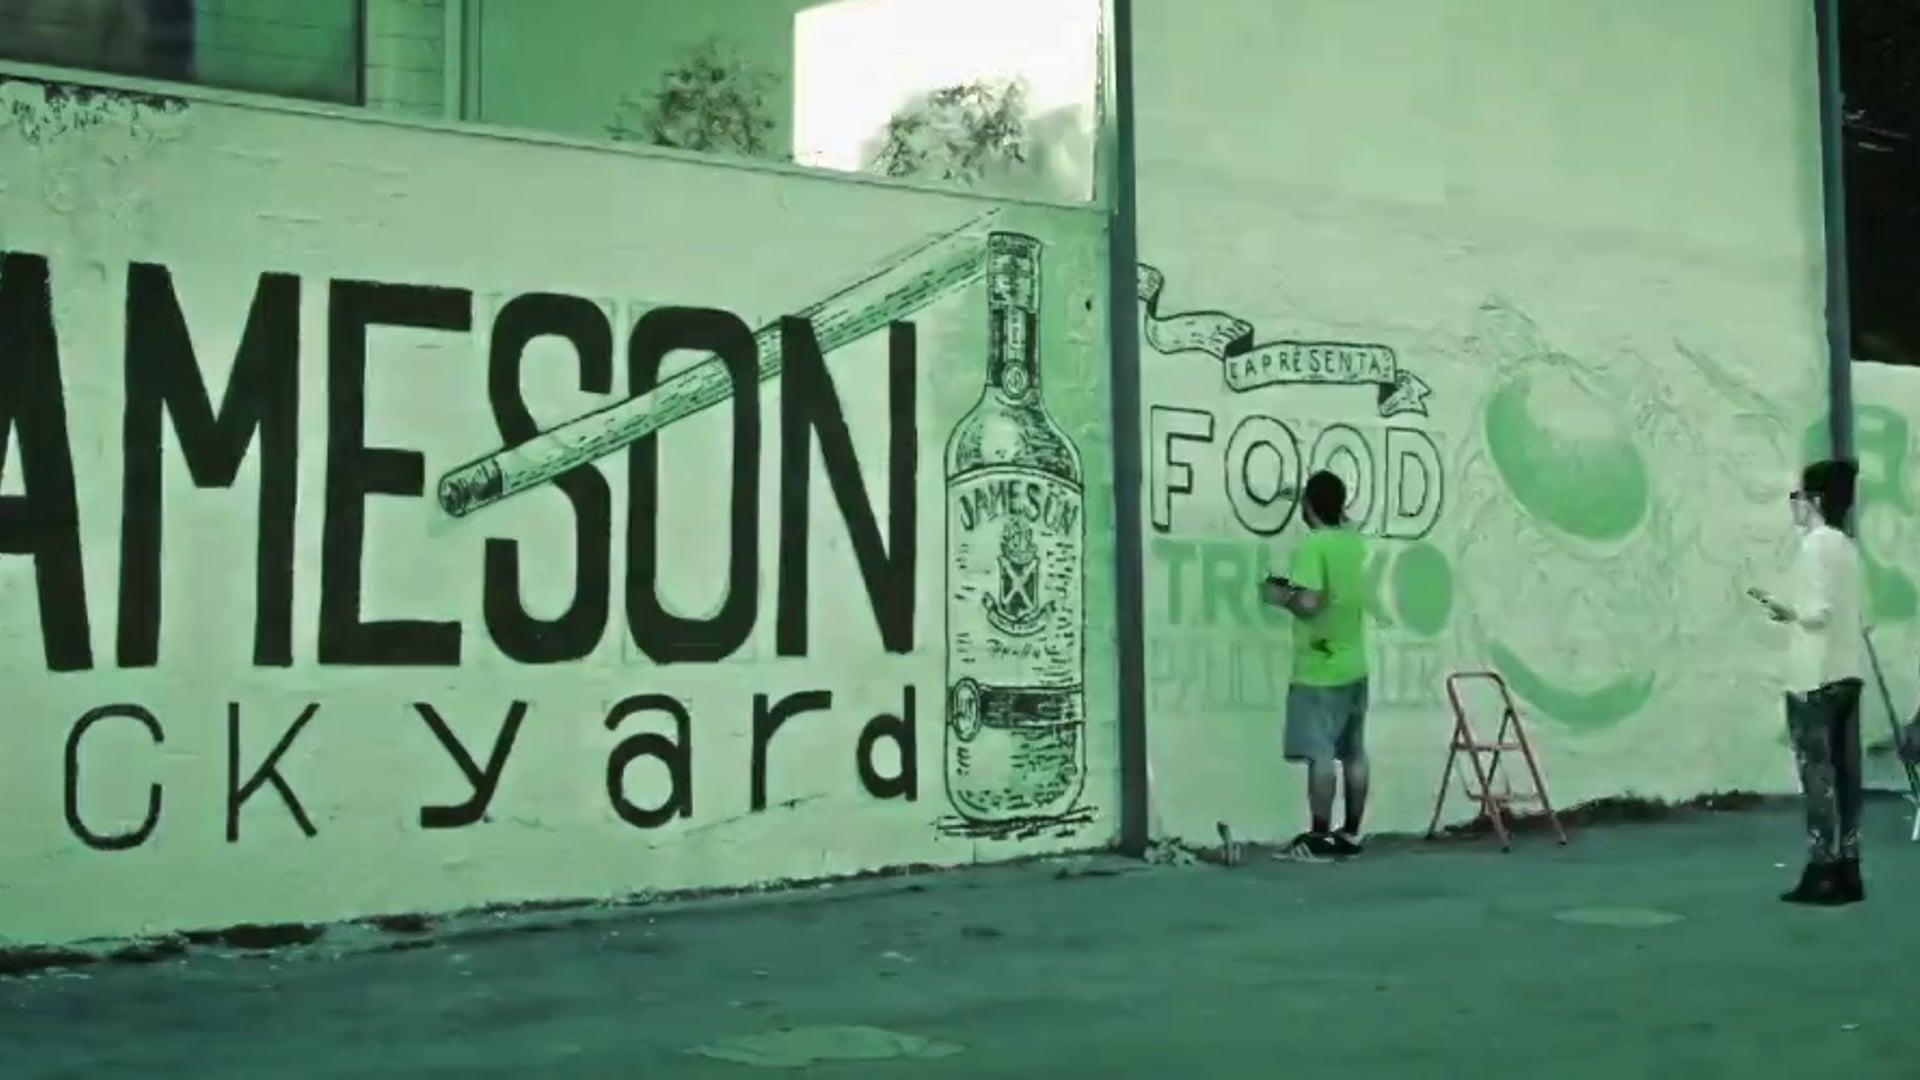 FOOD TRUCK JAMESON